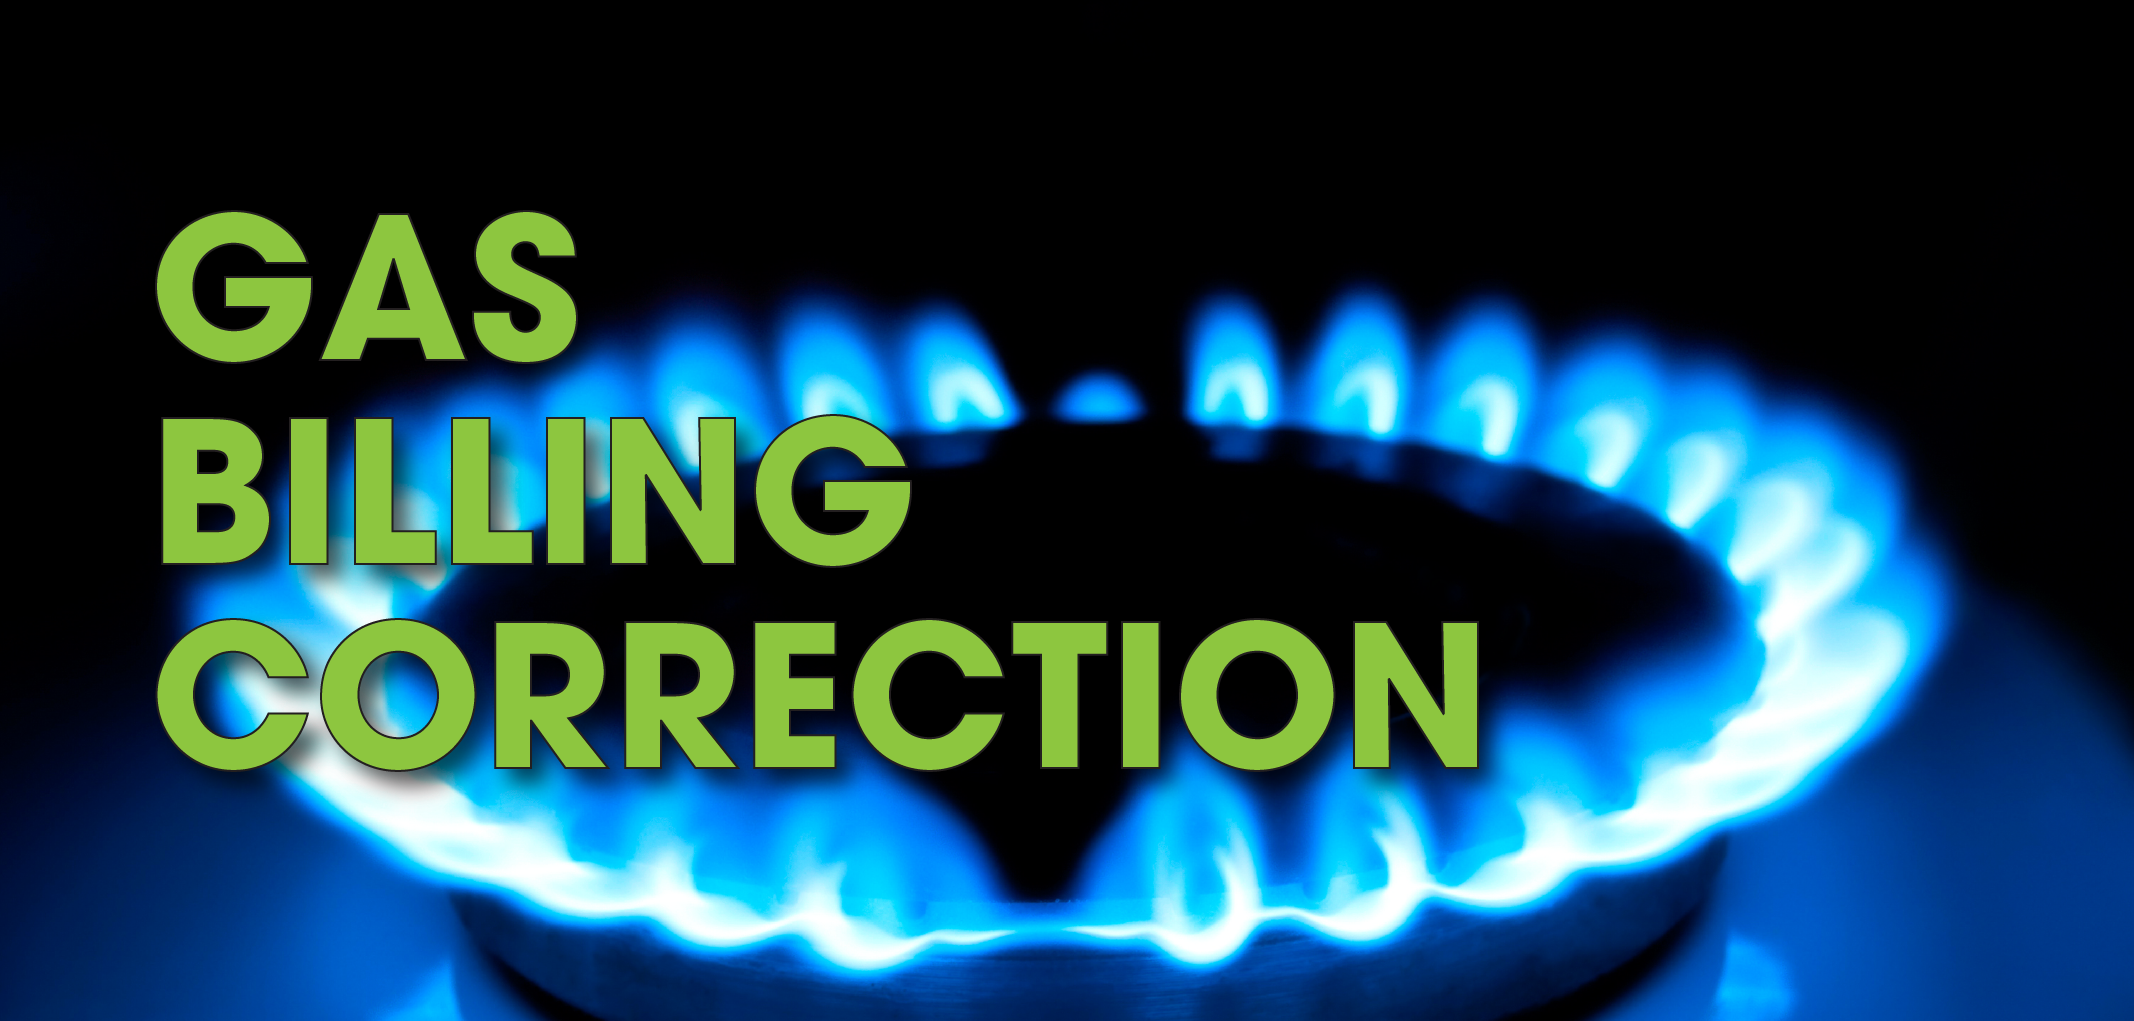 Gas Billing Correction